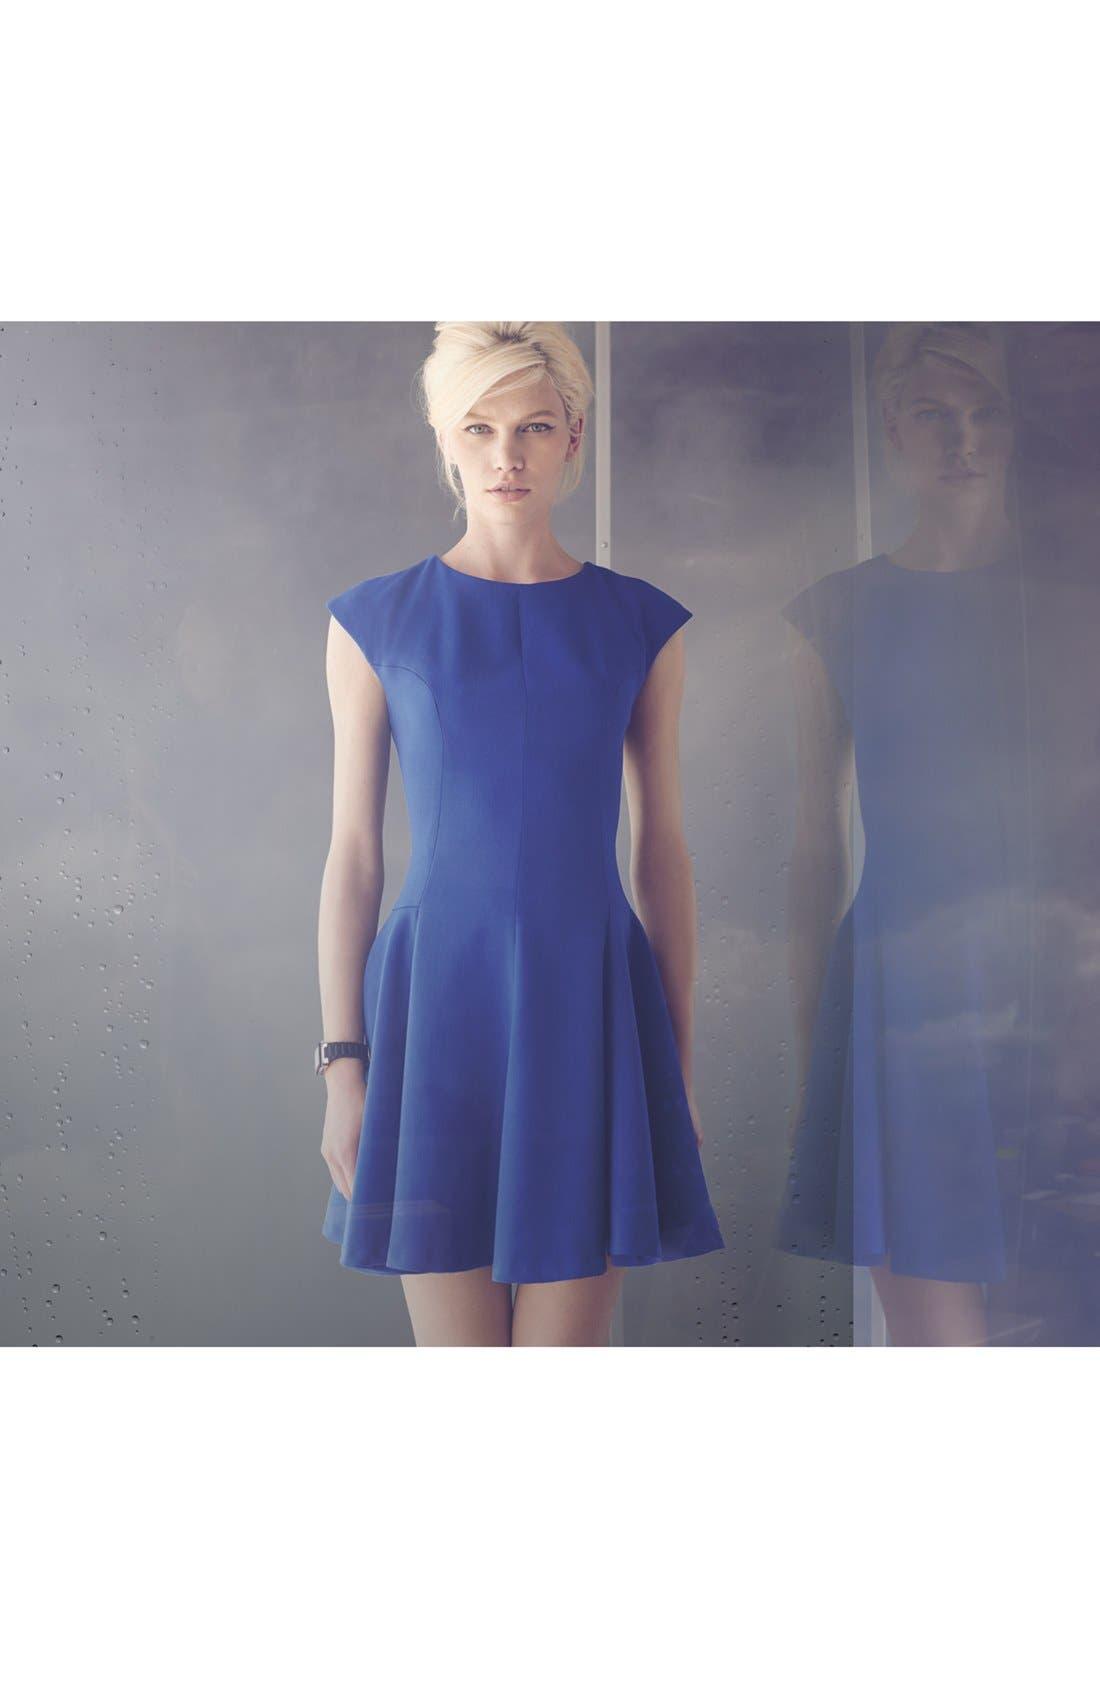 Alternate Image 1 Selected - Eliza J Skater Dress & Accessories